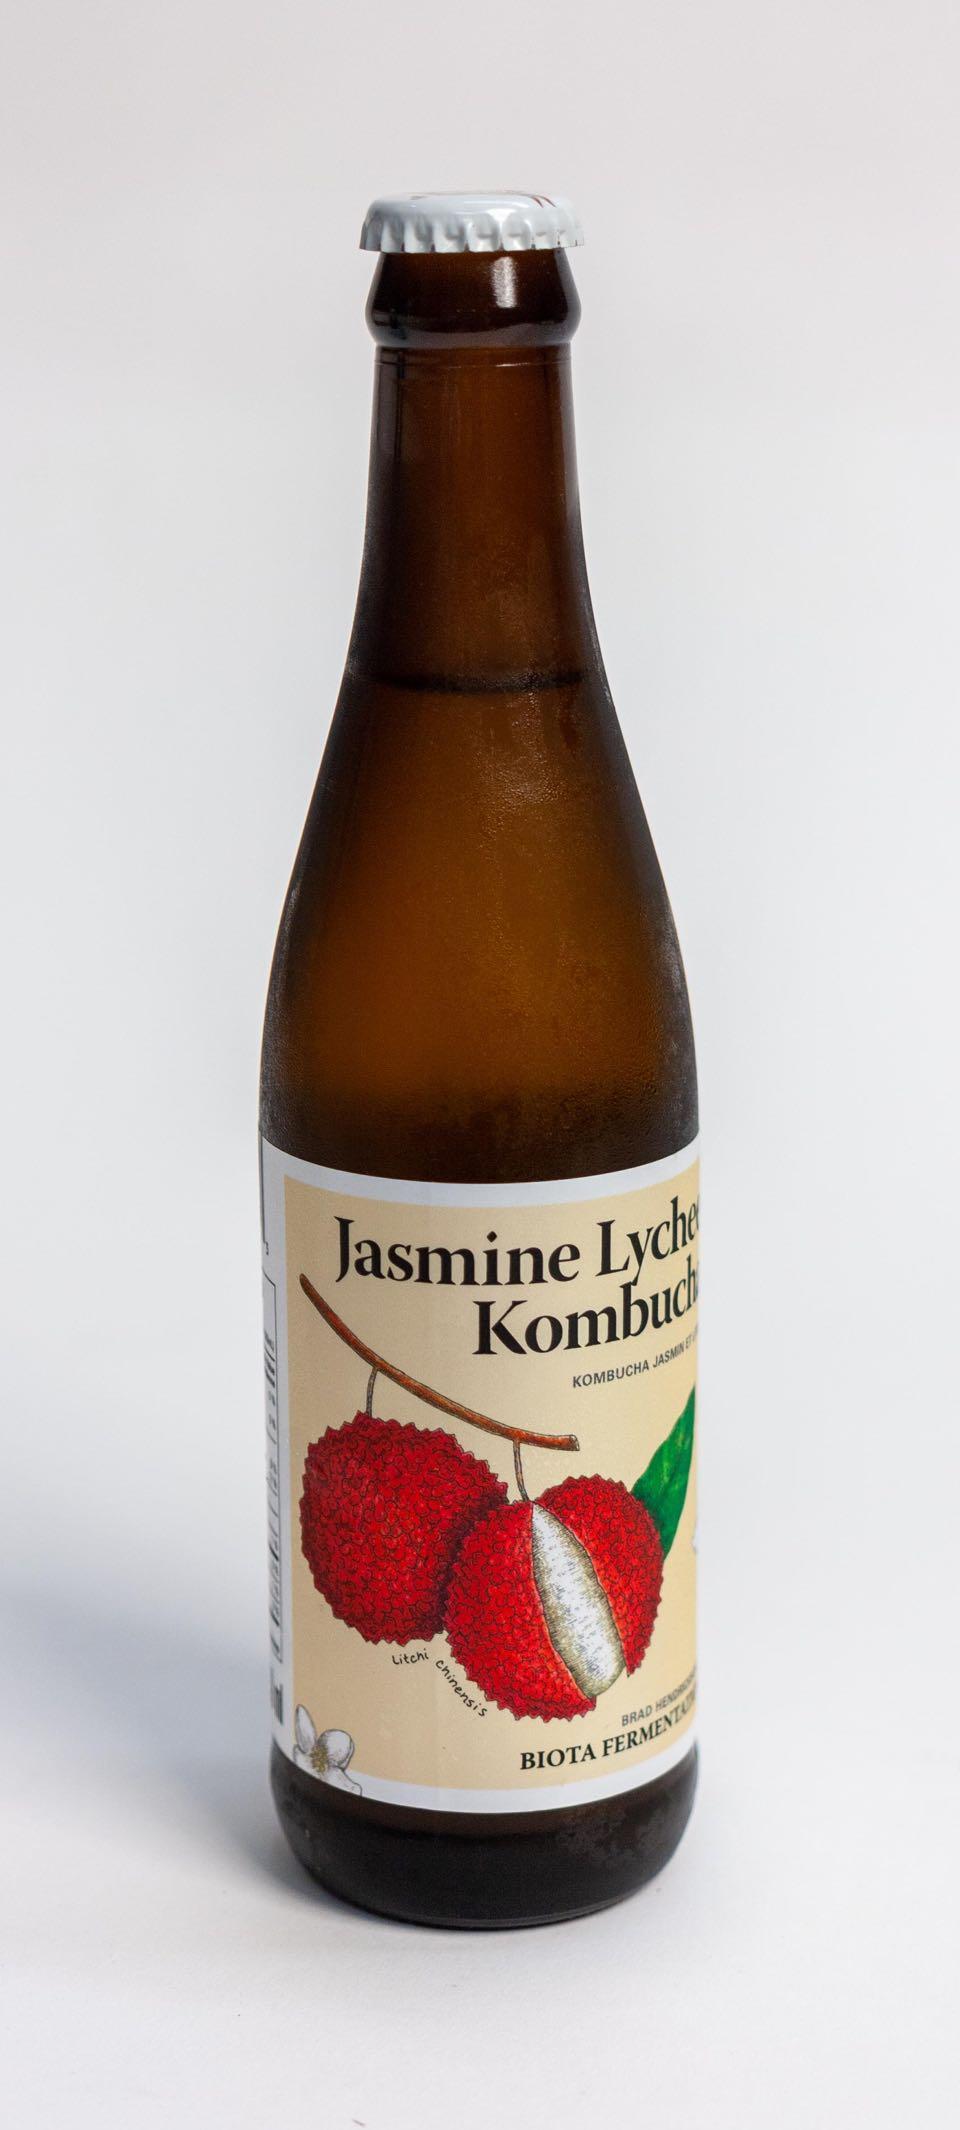 Biota Fermentation Jasmine Lychee Kombucha in 330ml bottle with vibrant red lychee illustration by Jessica Fraser — by Dima.